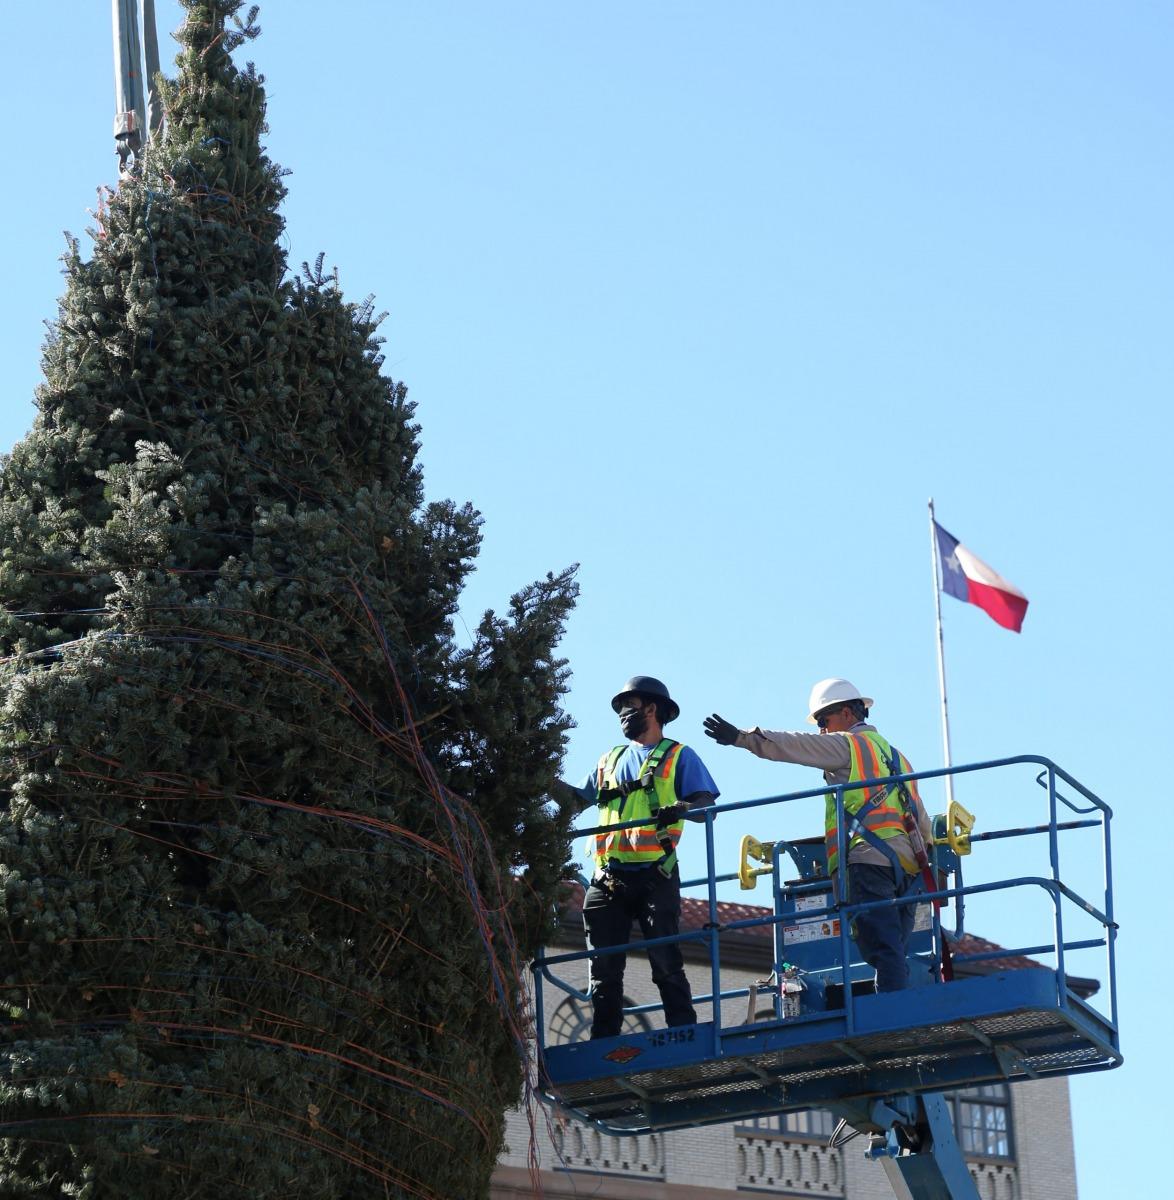 The H-E-B Christmas tree from Northern Michigan arrives Nov. 17, 2020, Travis Park. <em>Photo by Ben Olivo | Heron</em>